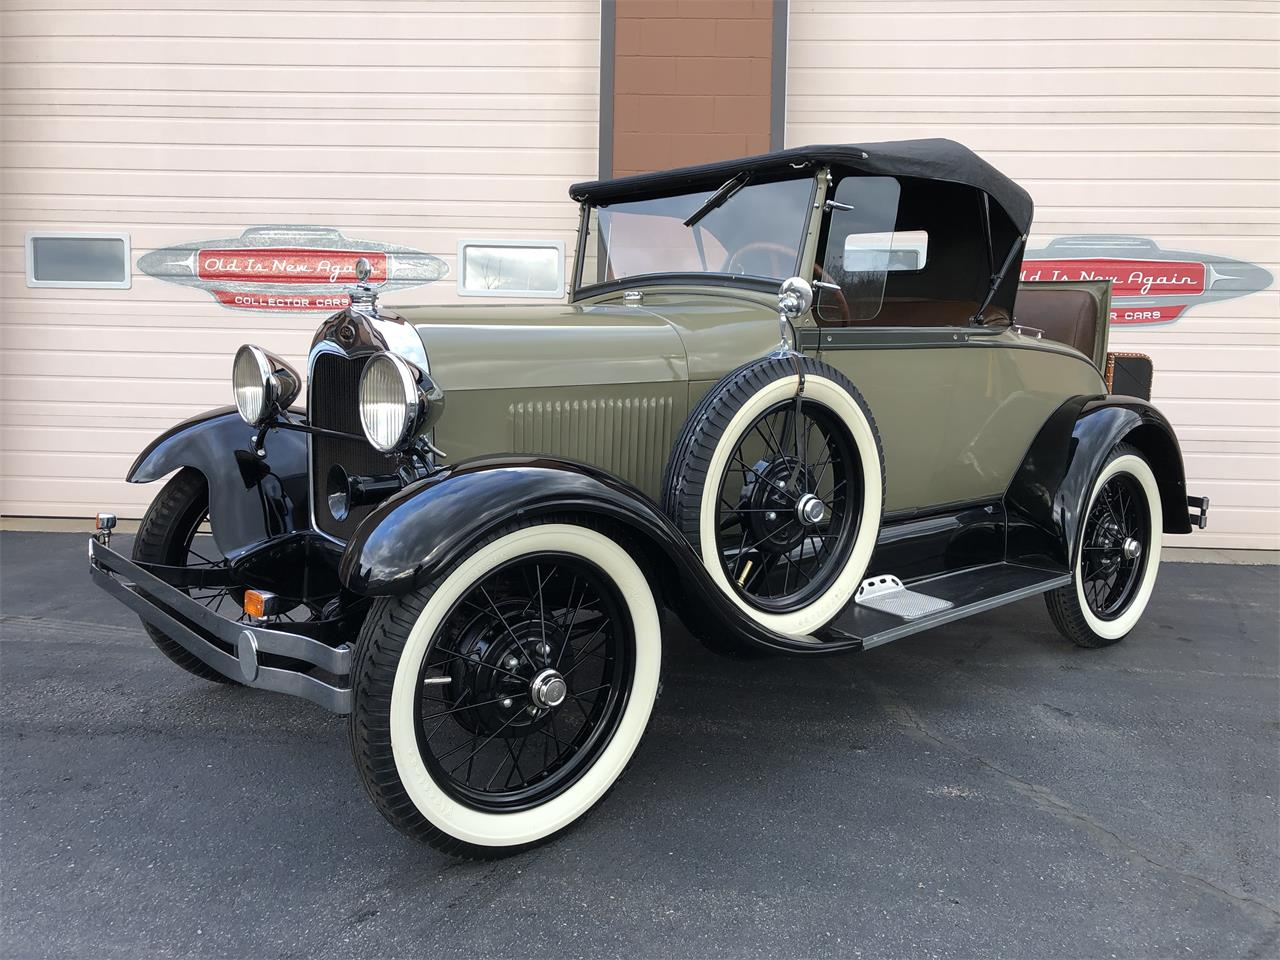 1928 ford model a for sale classiccars.com cc-1313024